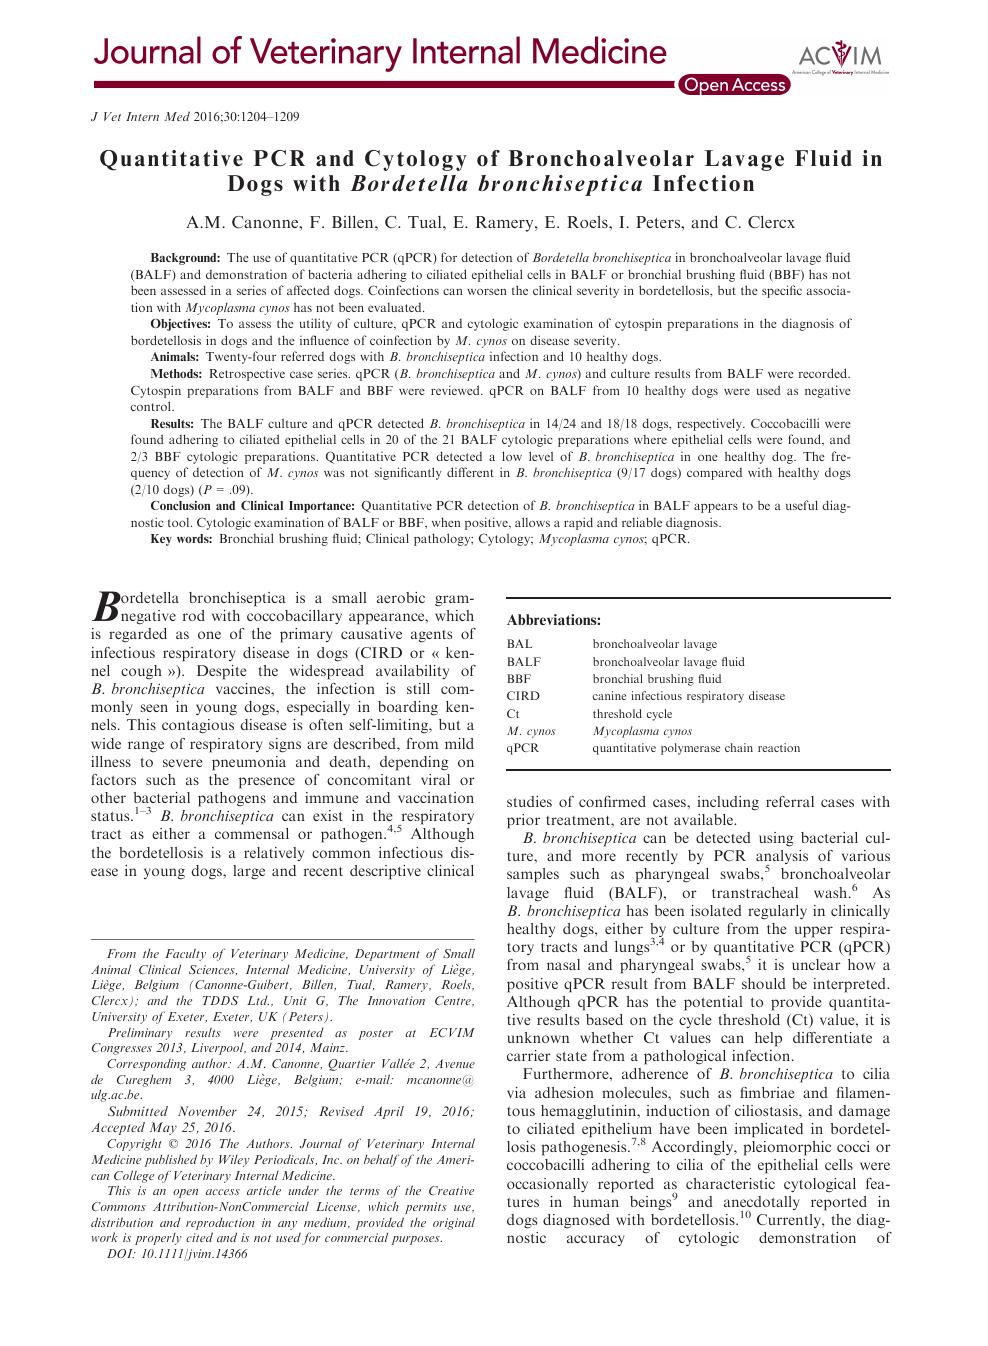 Quantitative PCR and Cytology of Bronchoalveolar Lavage